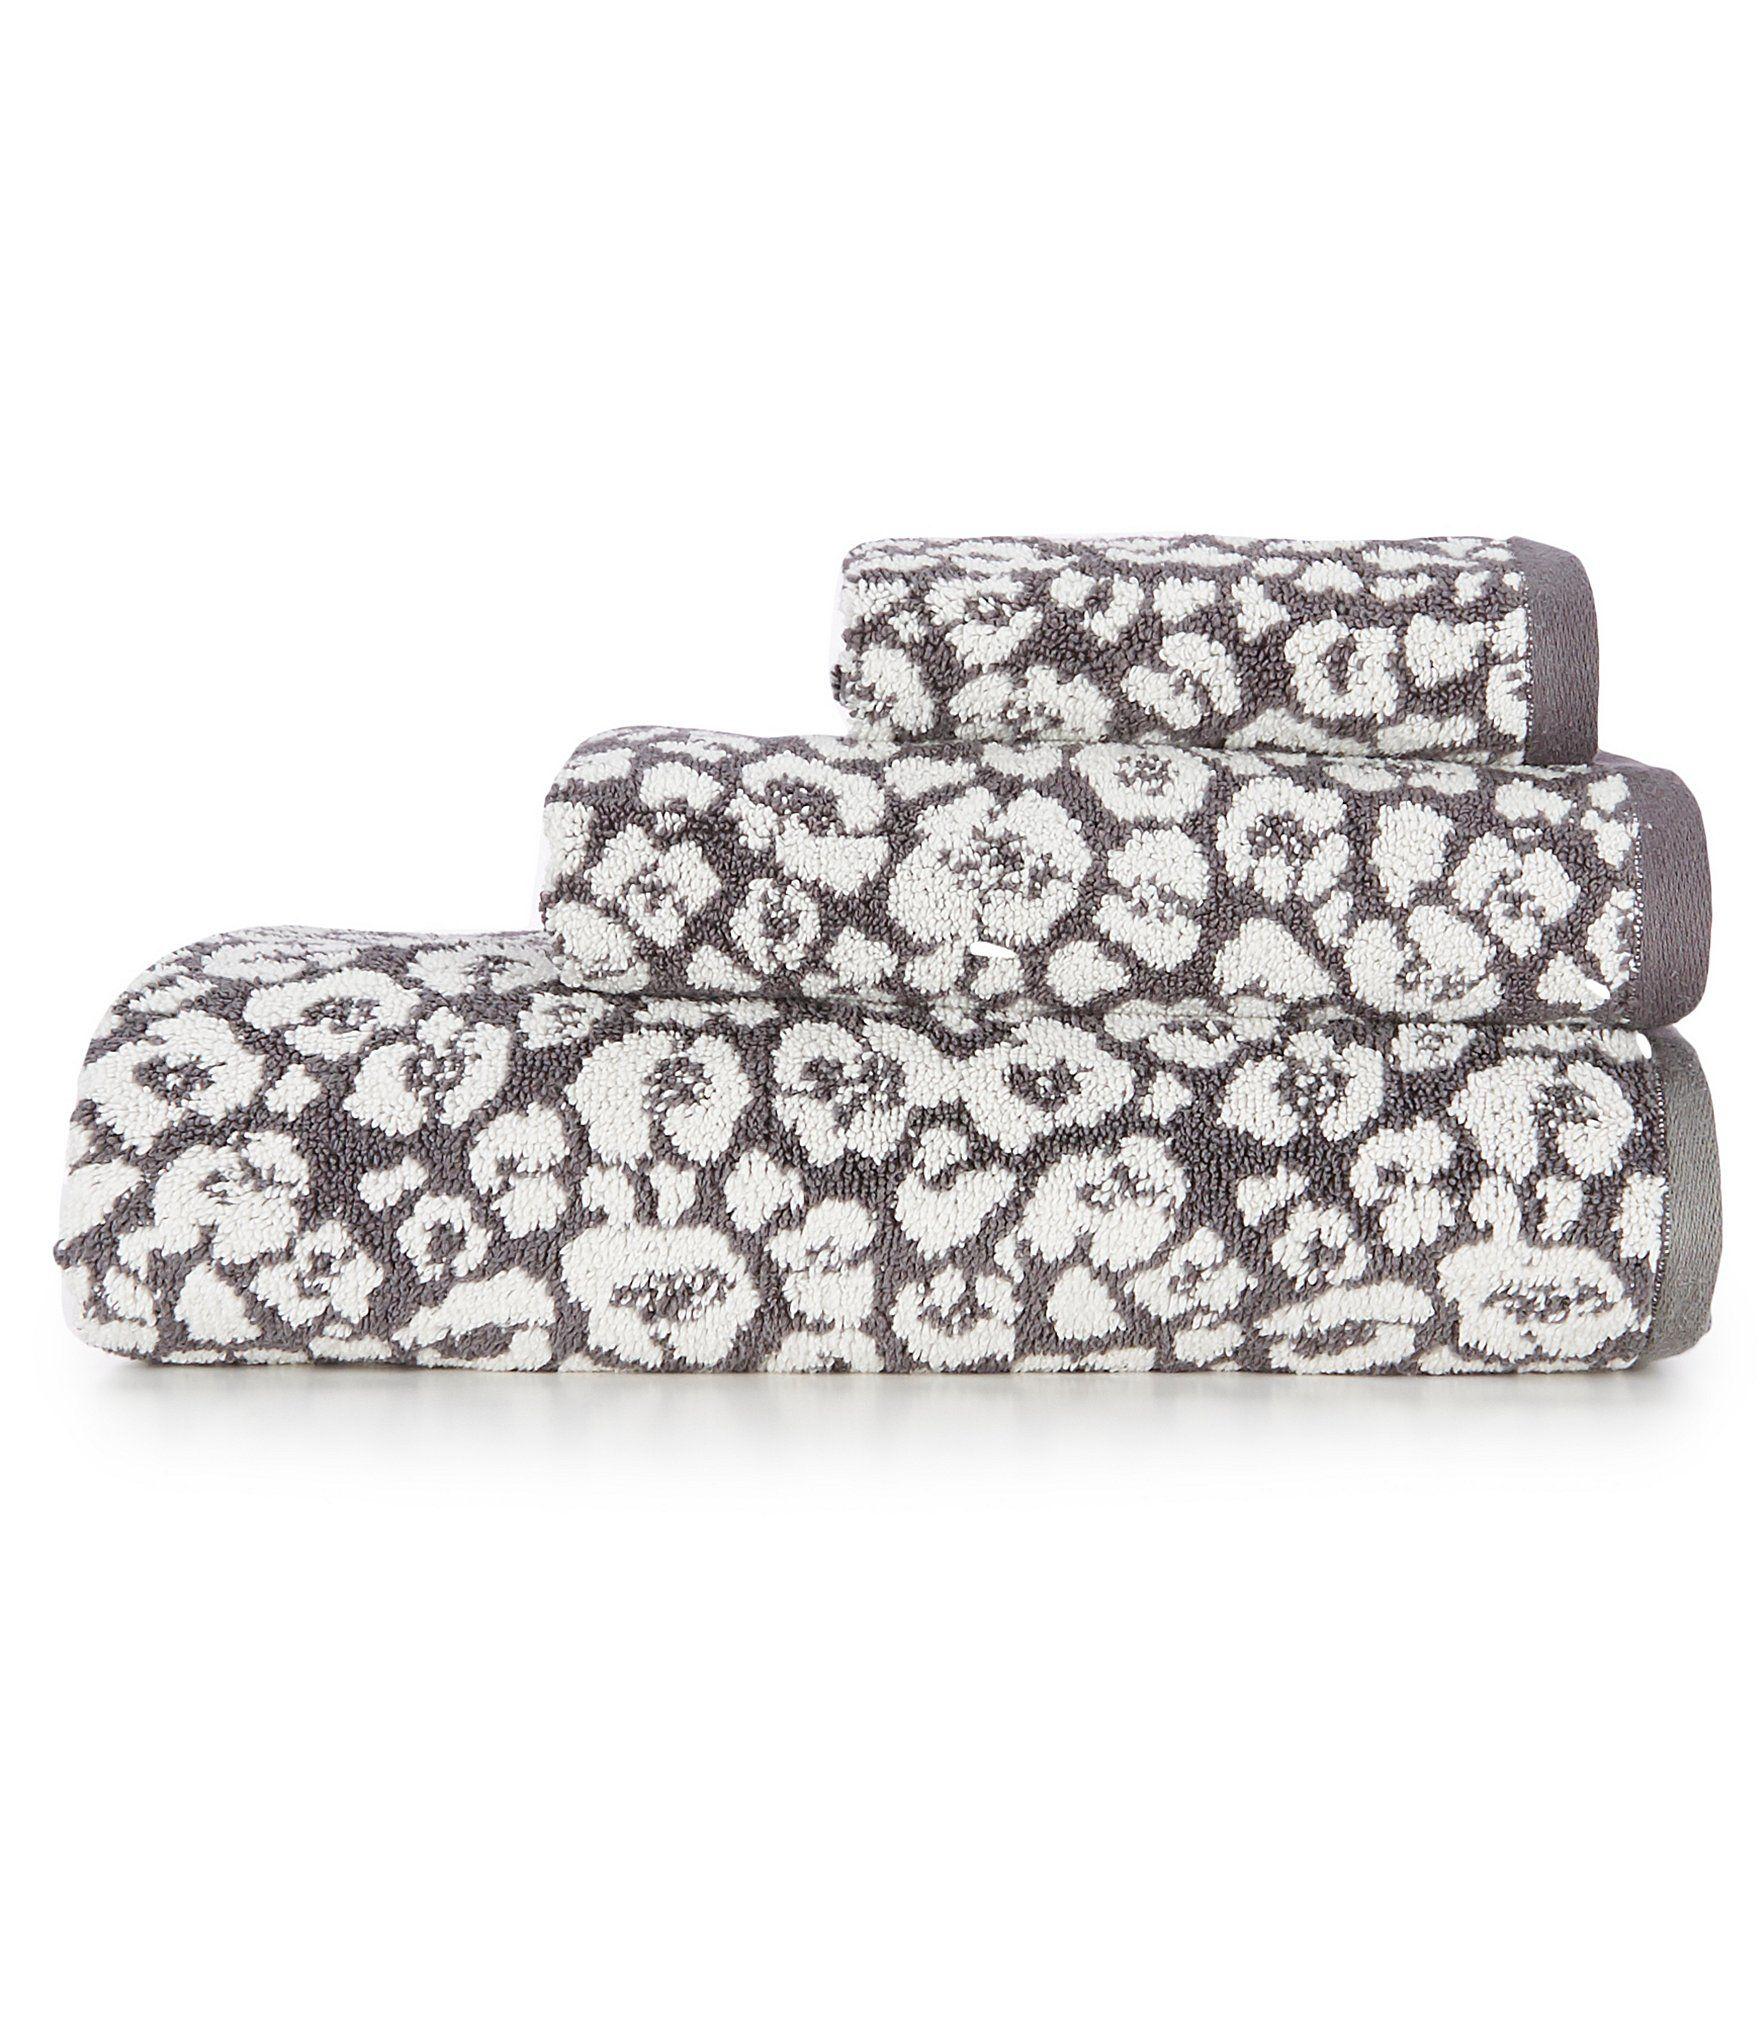 Southern Living Savannah Leopard Bath Towels - Taupe Bath Towel #handtowels